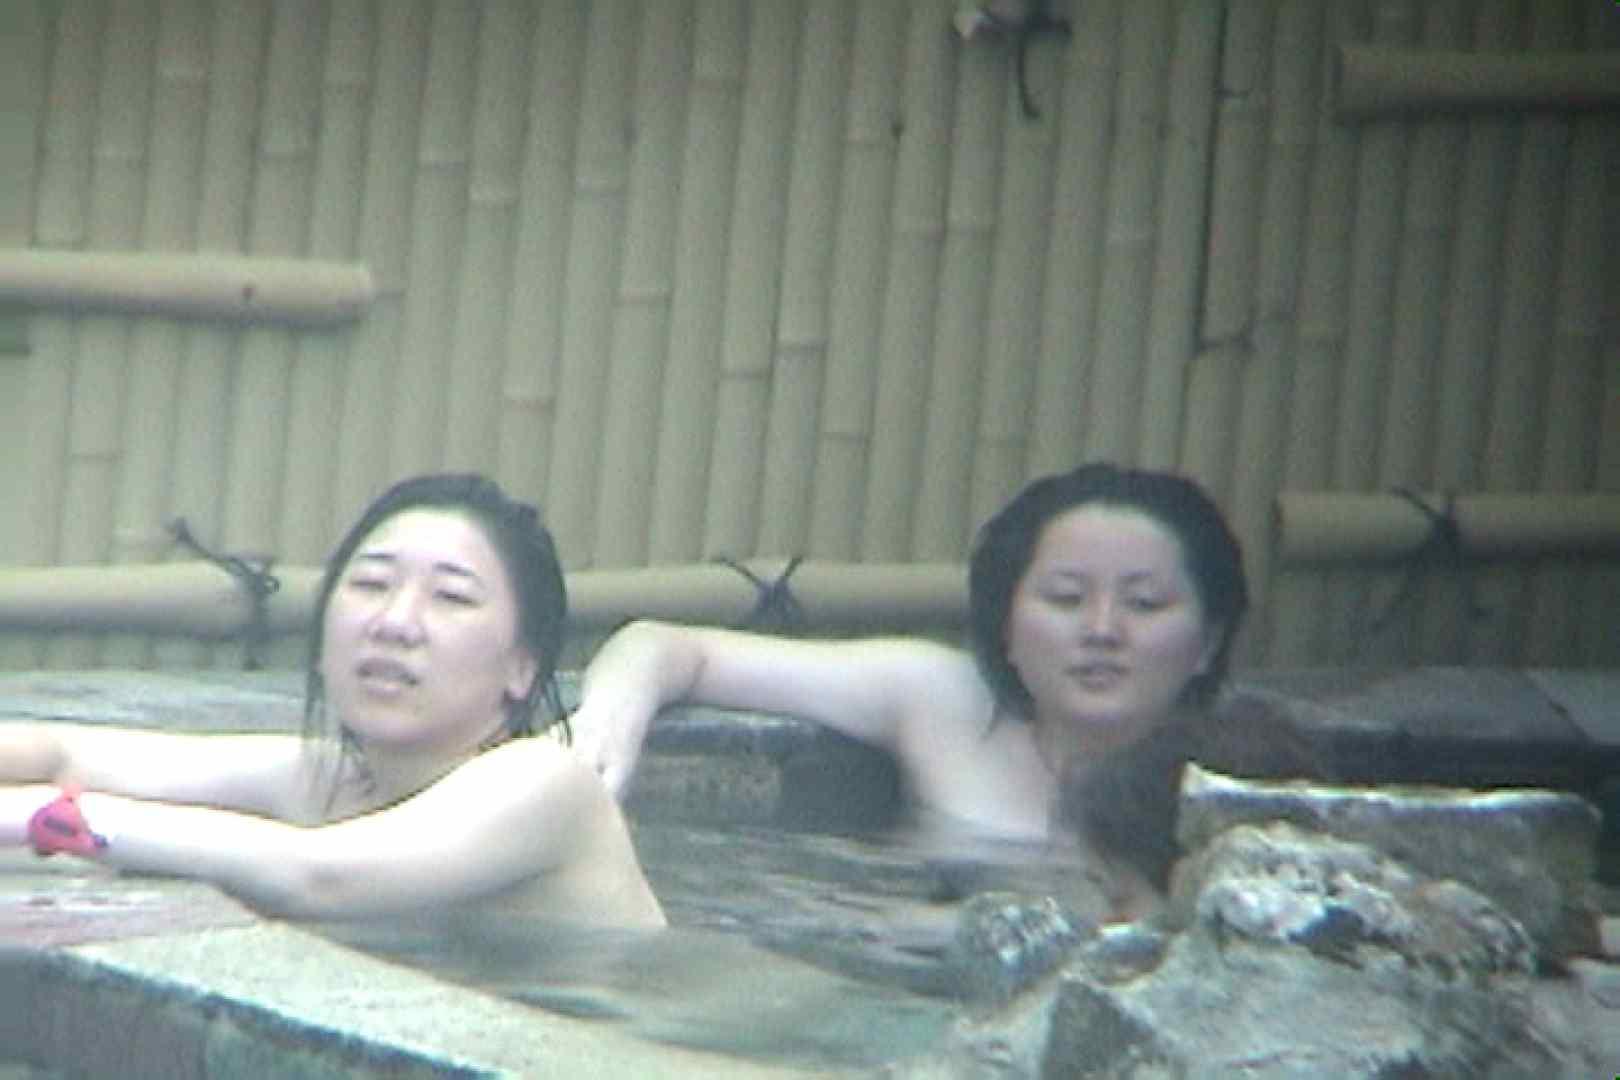 Aquaな露天風呂Vol.107 OLセックス 隠し撮りオマンコ動画紹介 63画像 29